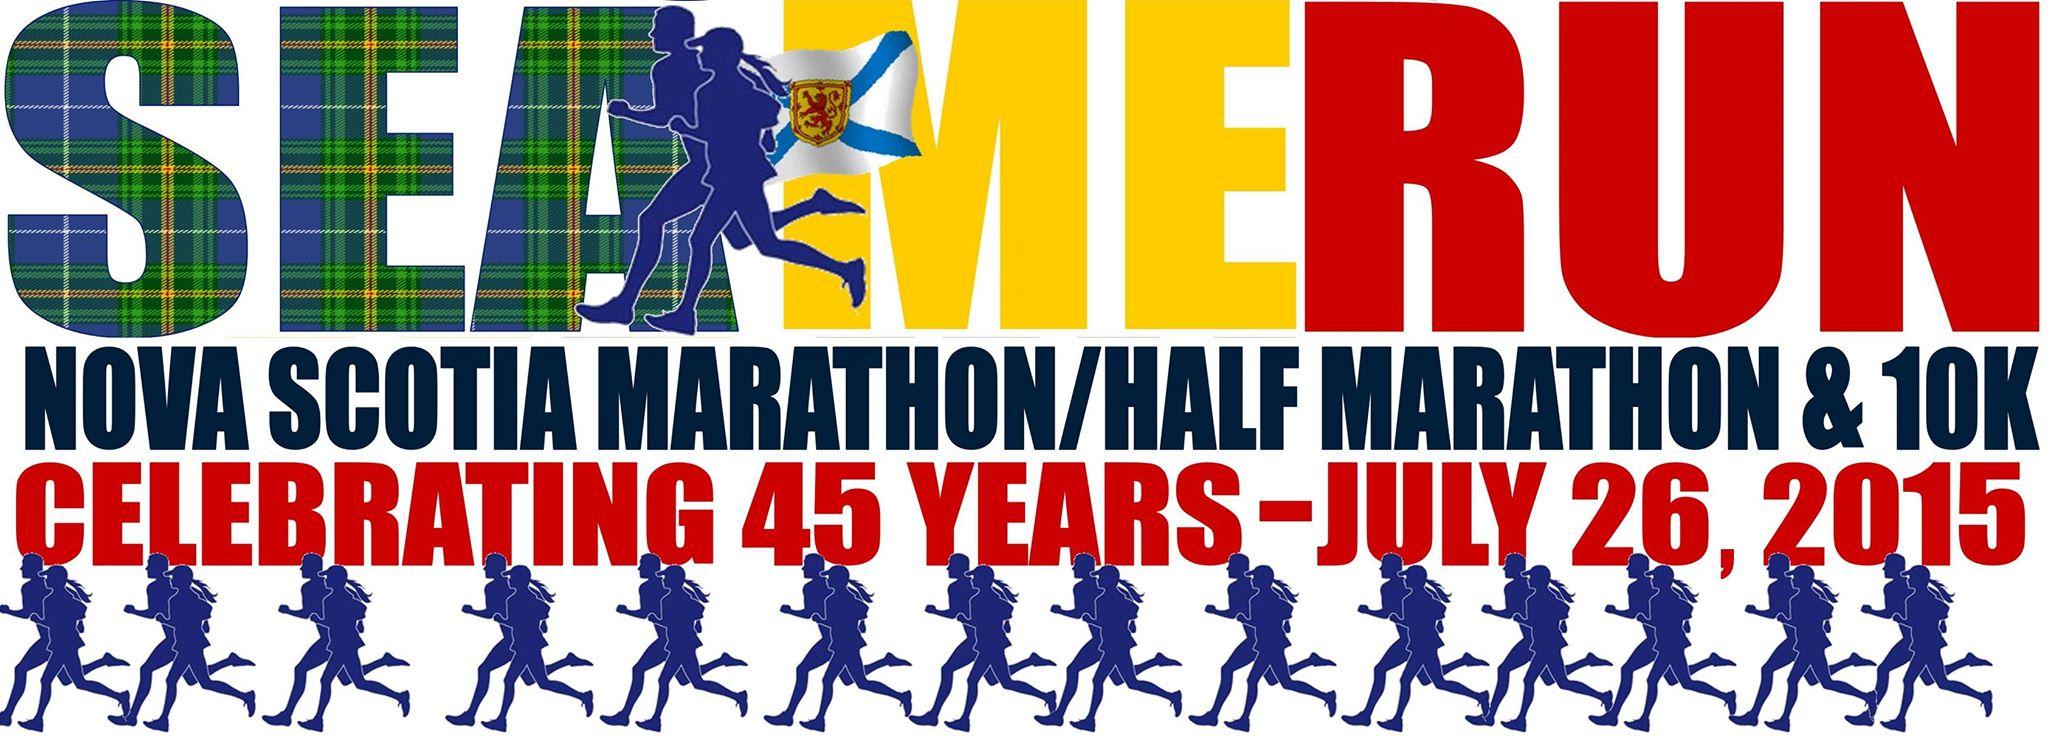 Registration is Open for the 45th Annual Nova Scotia Marathon Half Marathon and 10 km